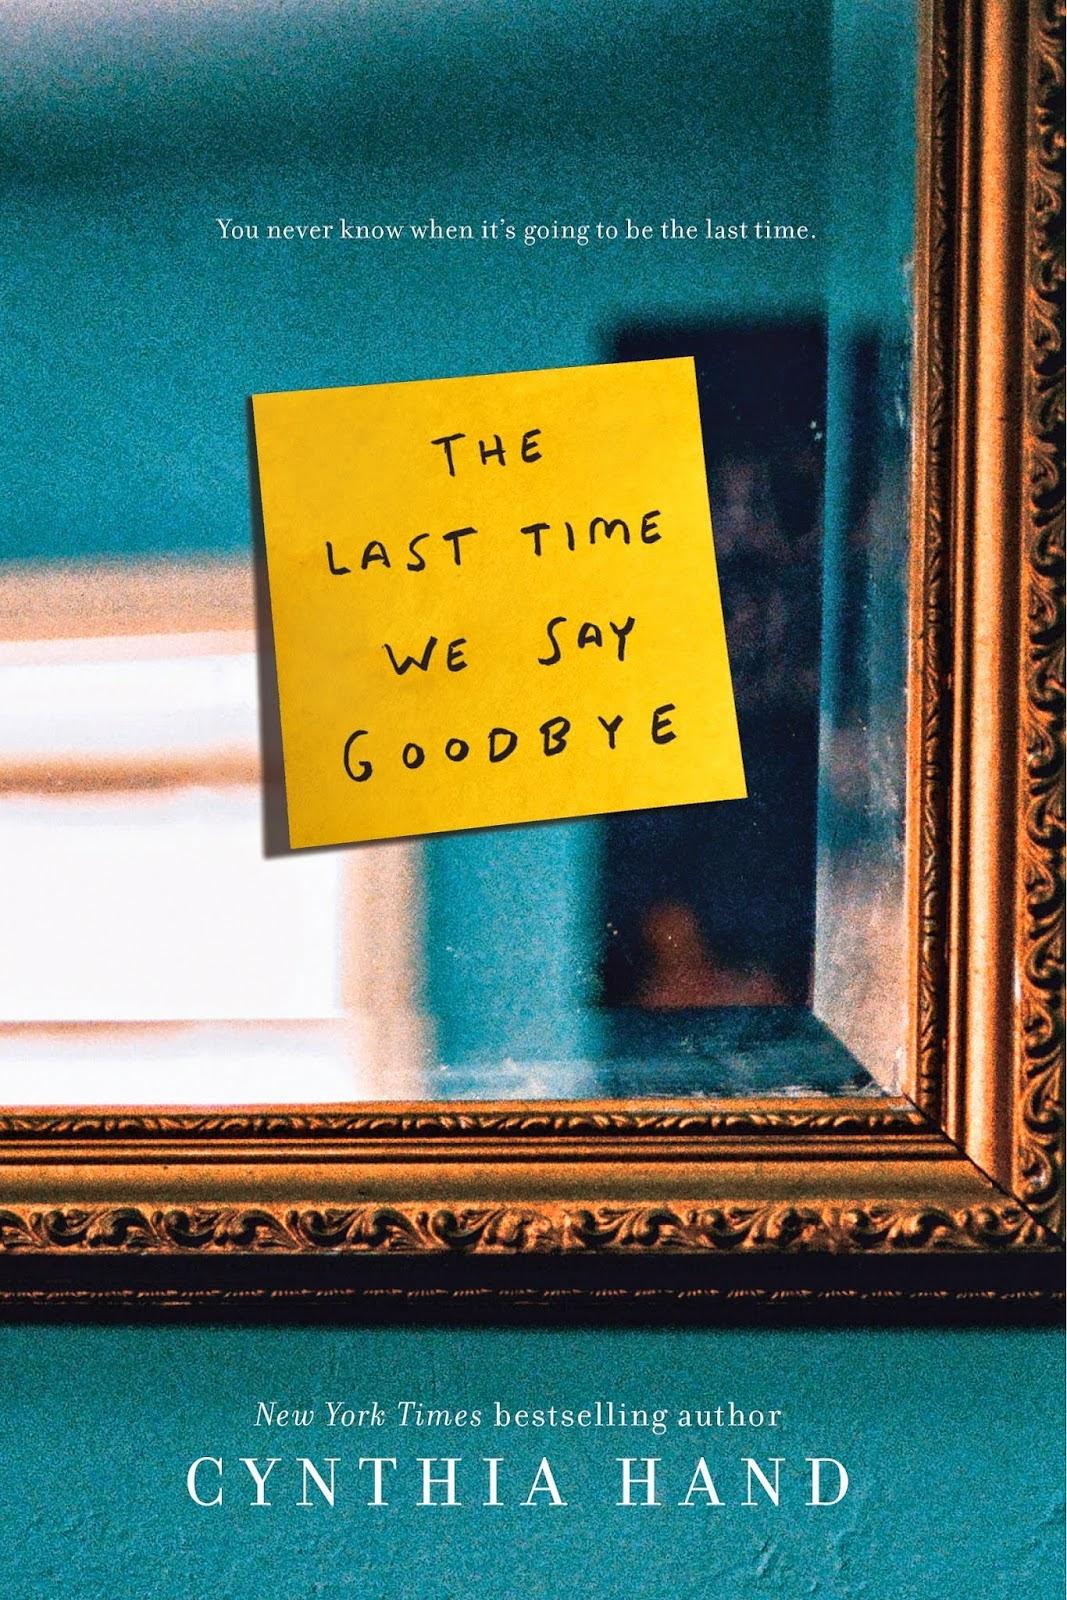 The Last Time We Said GoodBye by Cynthia Hand